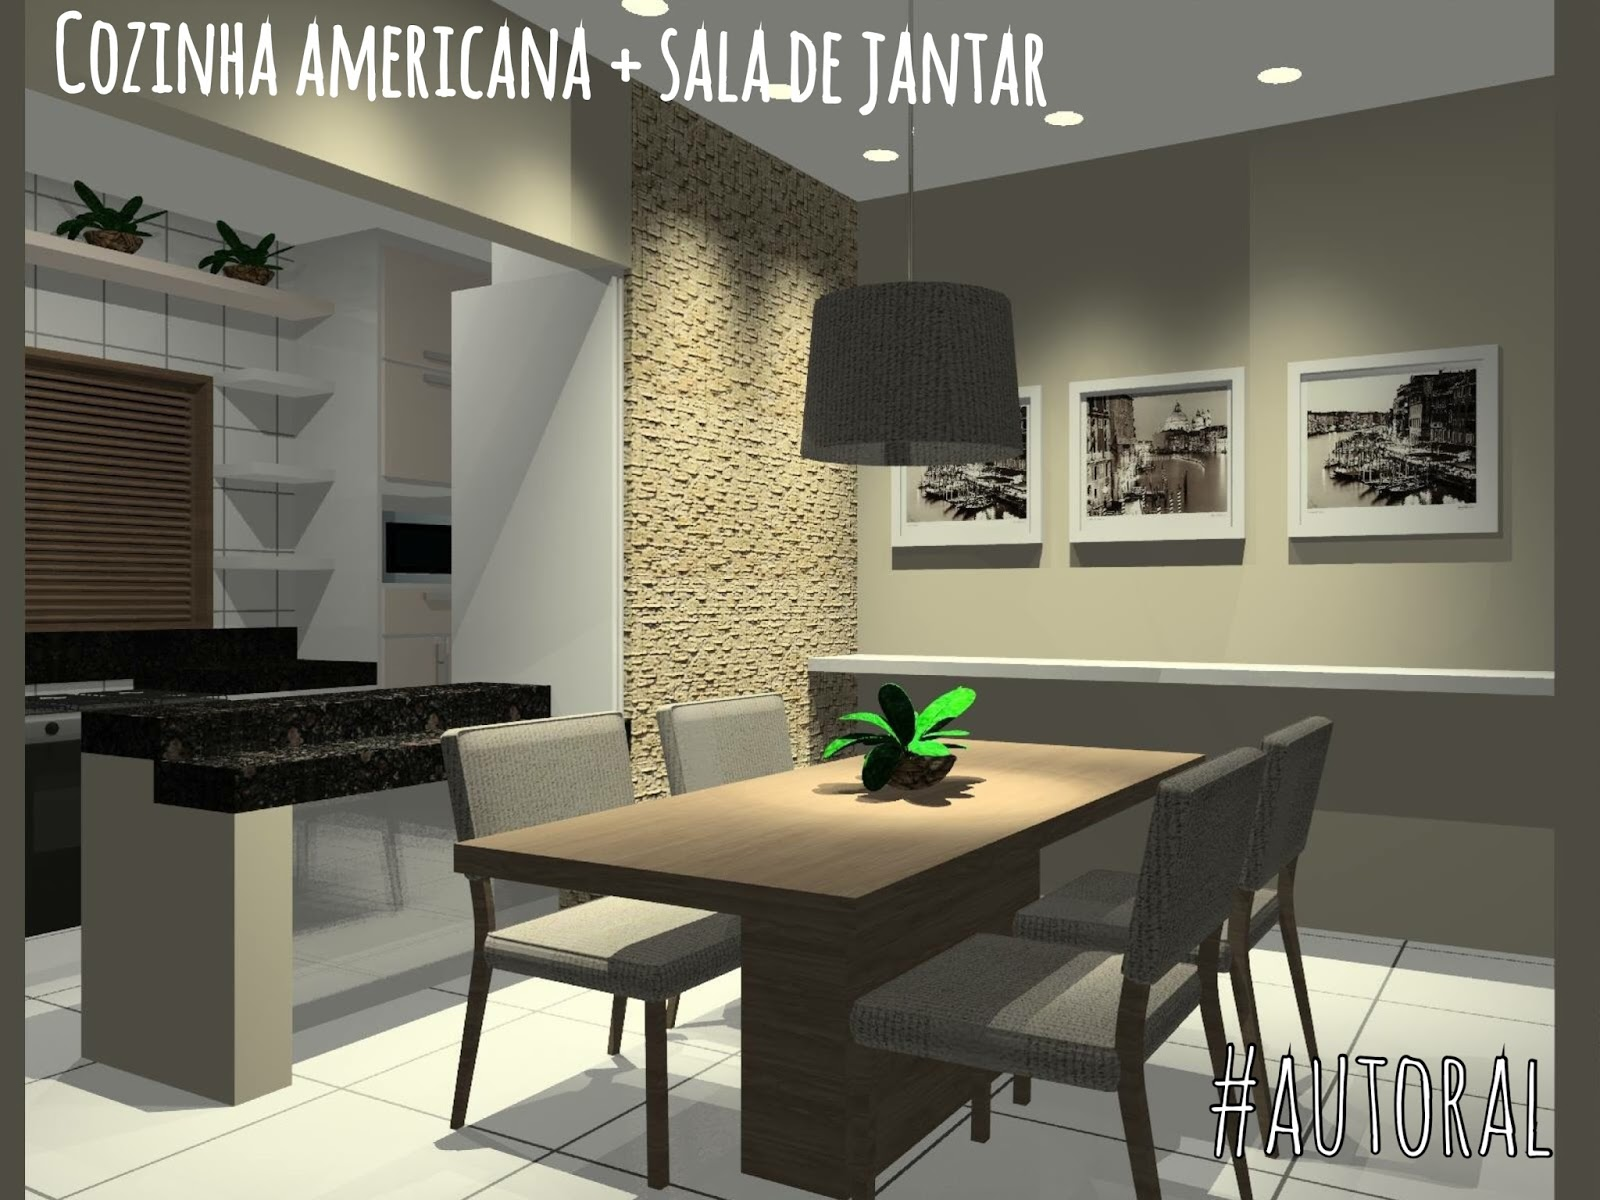 Bianca Tereza: A.022012 Cozinha americana   Sala de Jantar #27B318 1600 1200